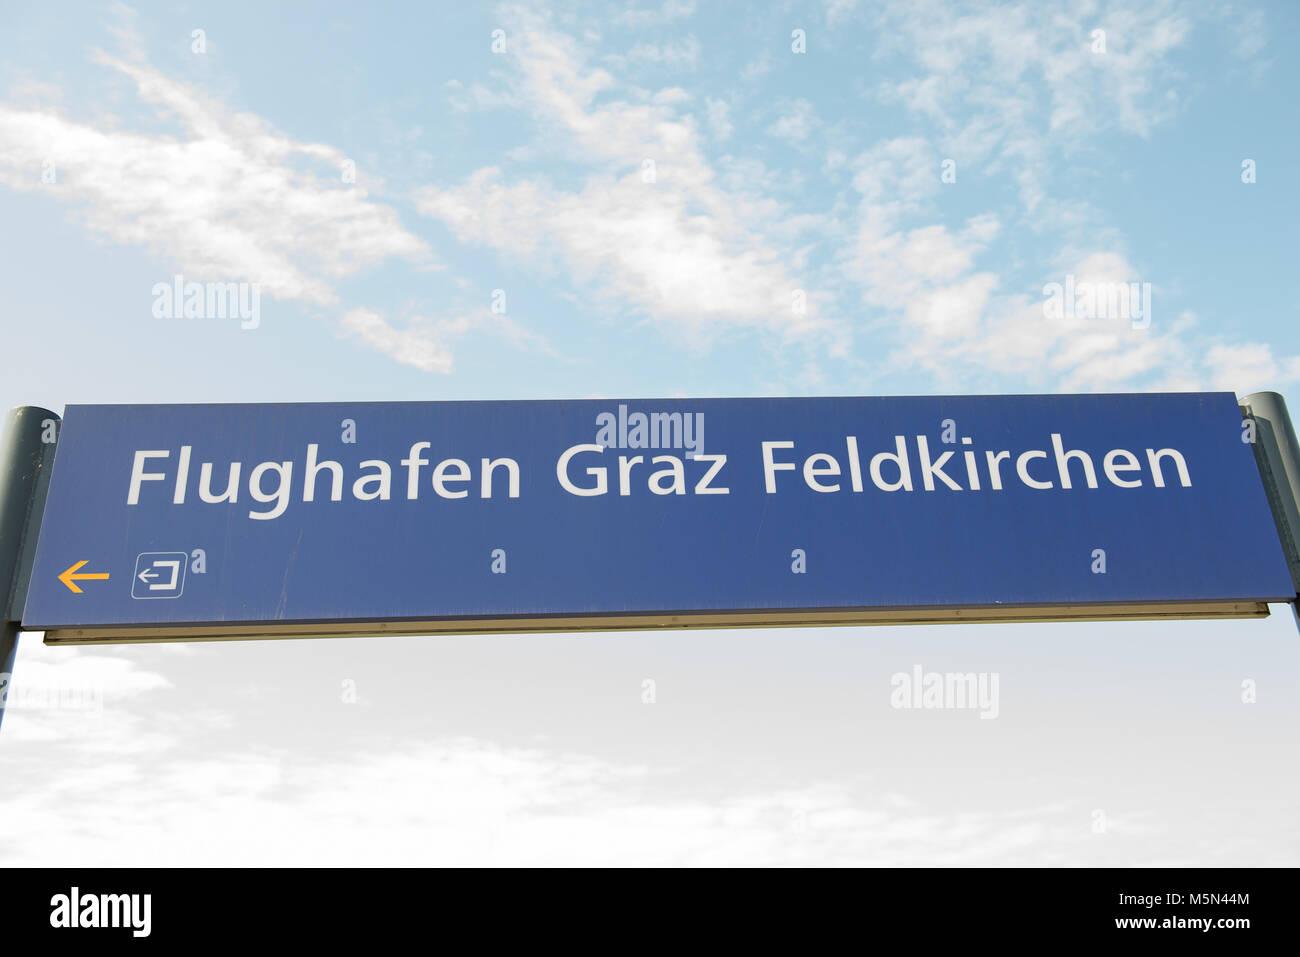 Train station sign in Austria Flughafen Graz Feldkirchen - Stock Image